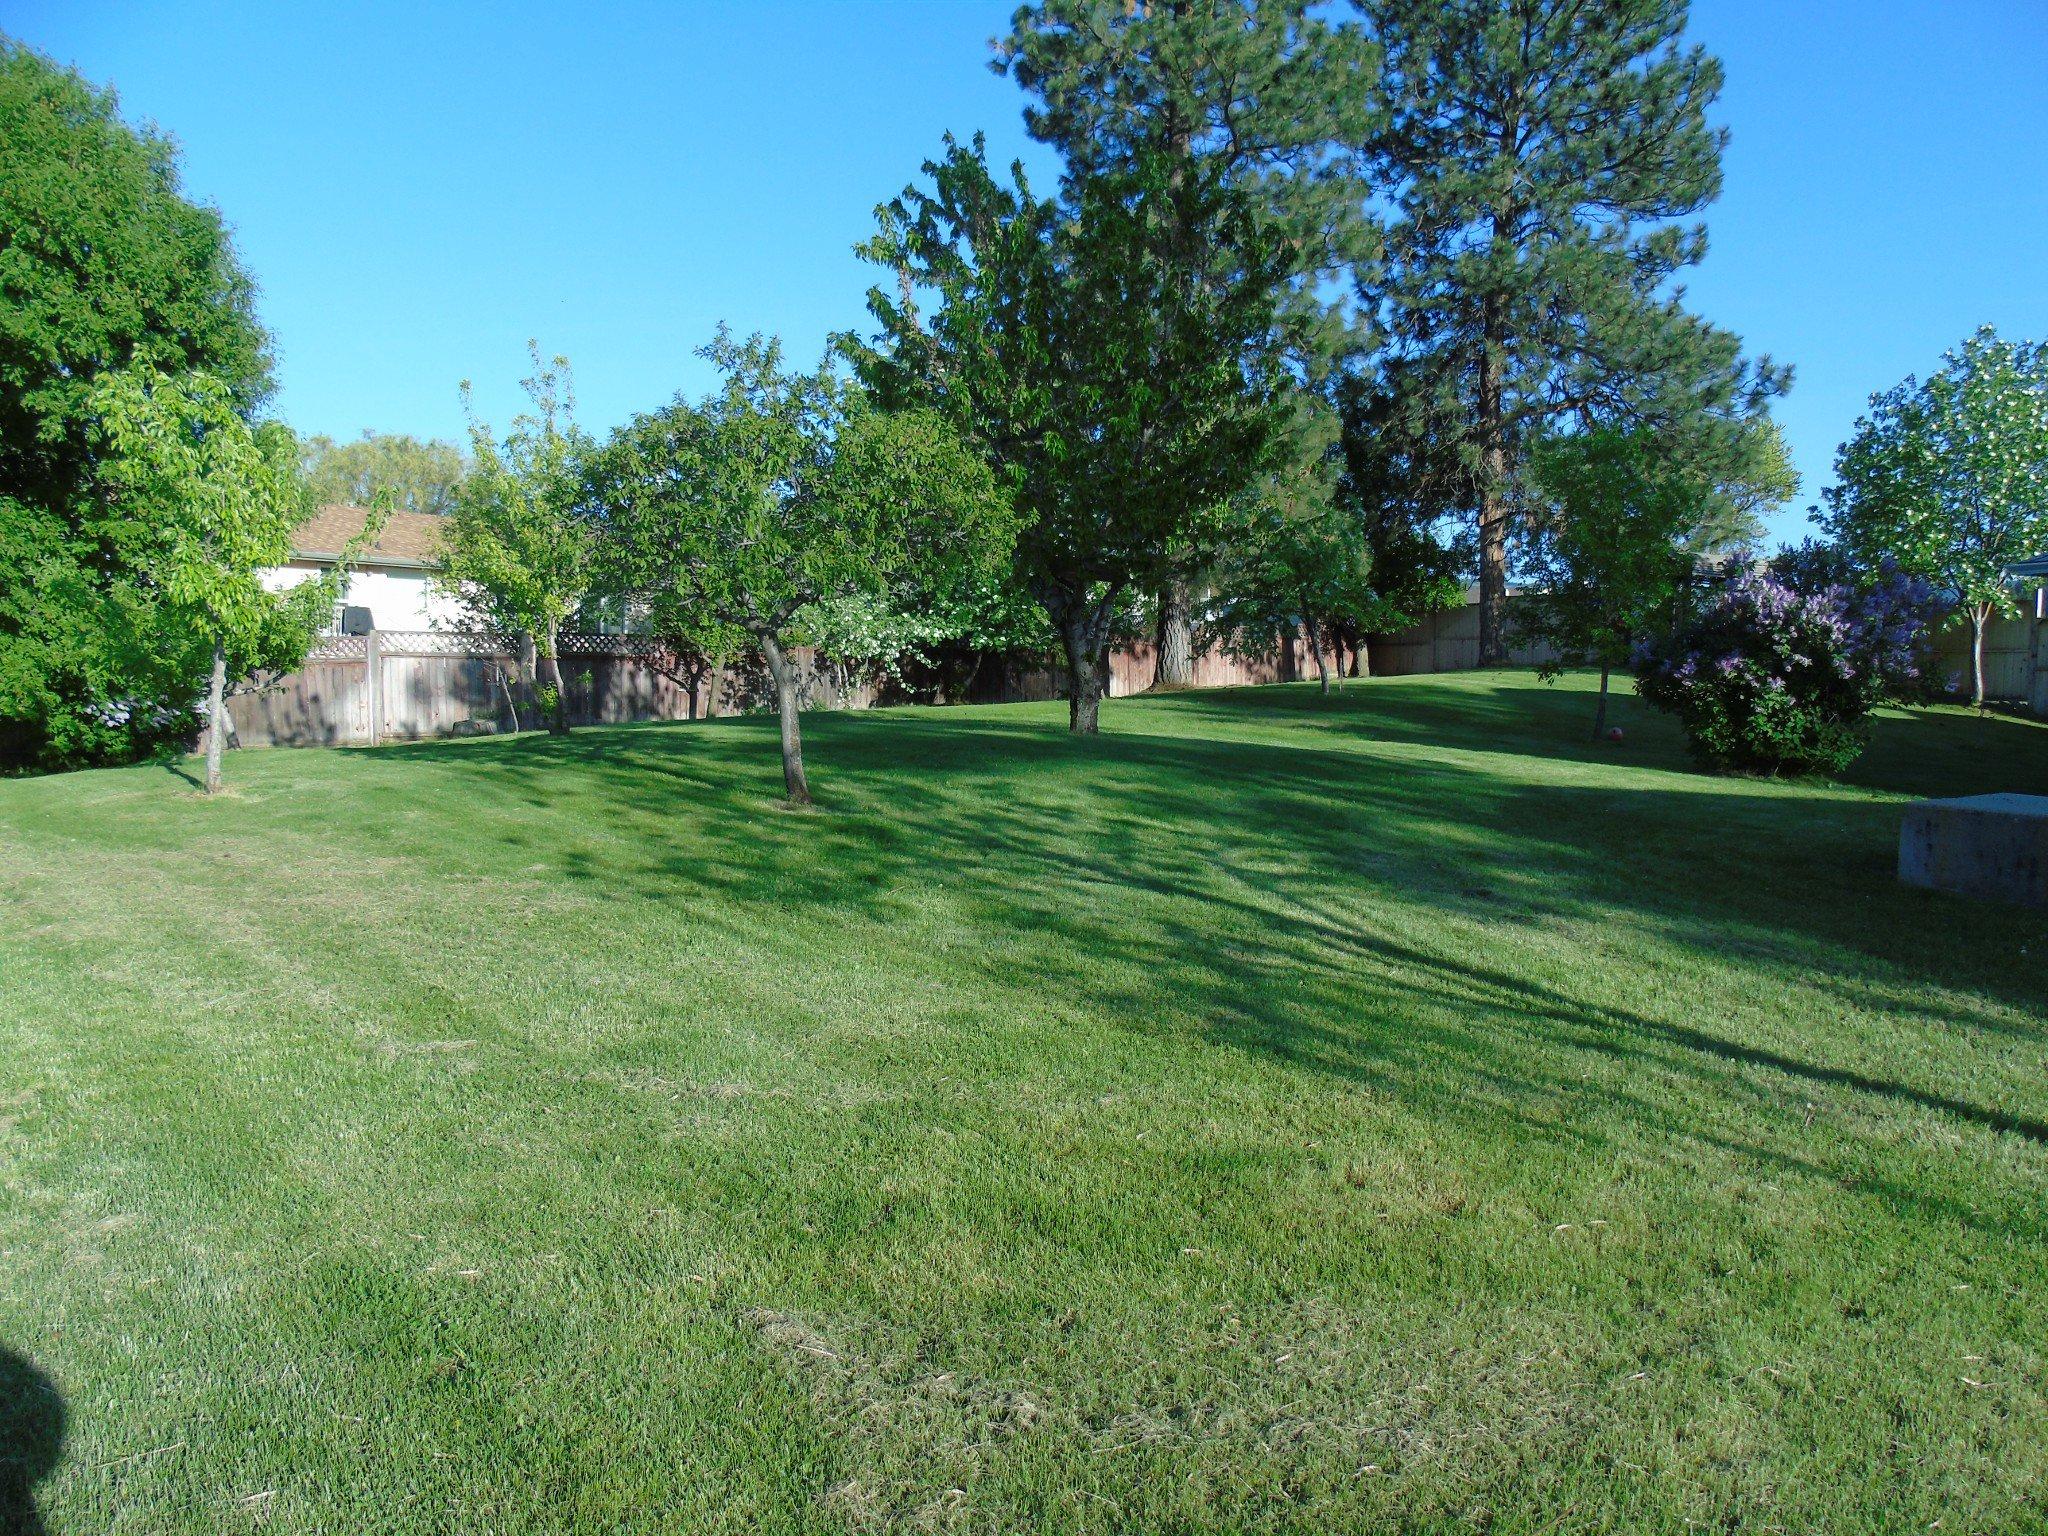 Photo 28: Photos: 6490 Barnhartvale Road in Kamloops: Barnhartvale House for sale : MLS®# New